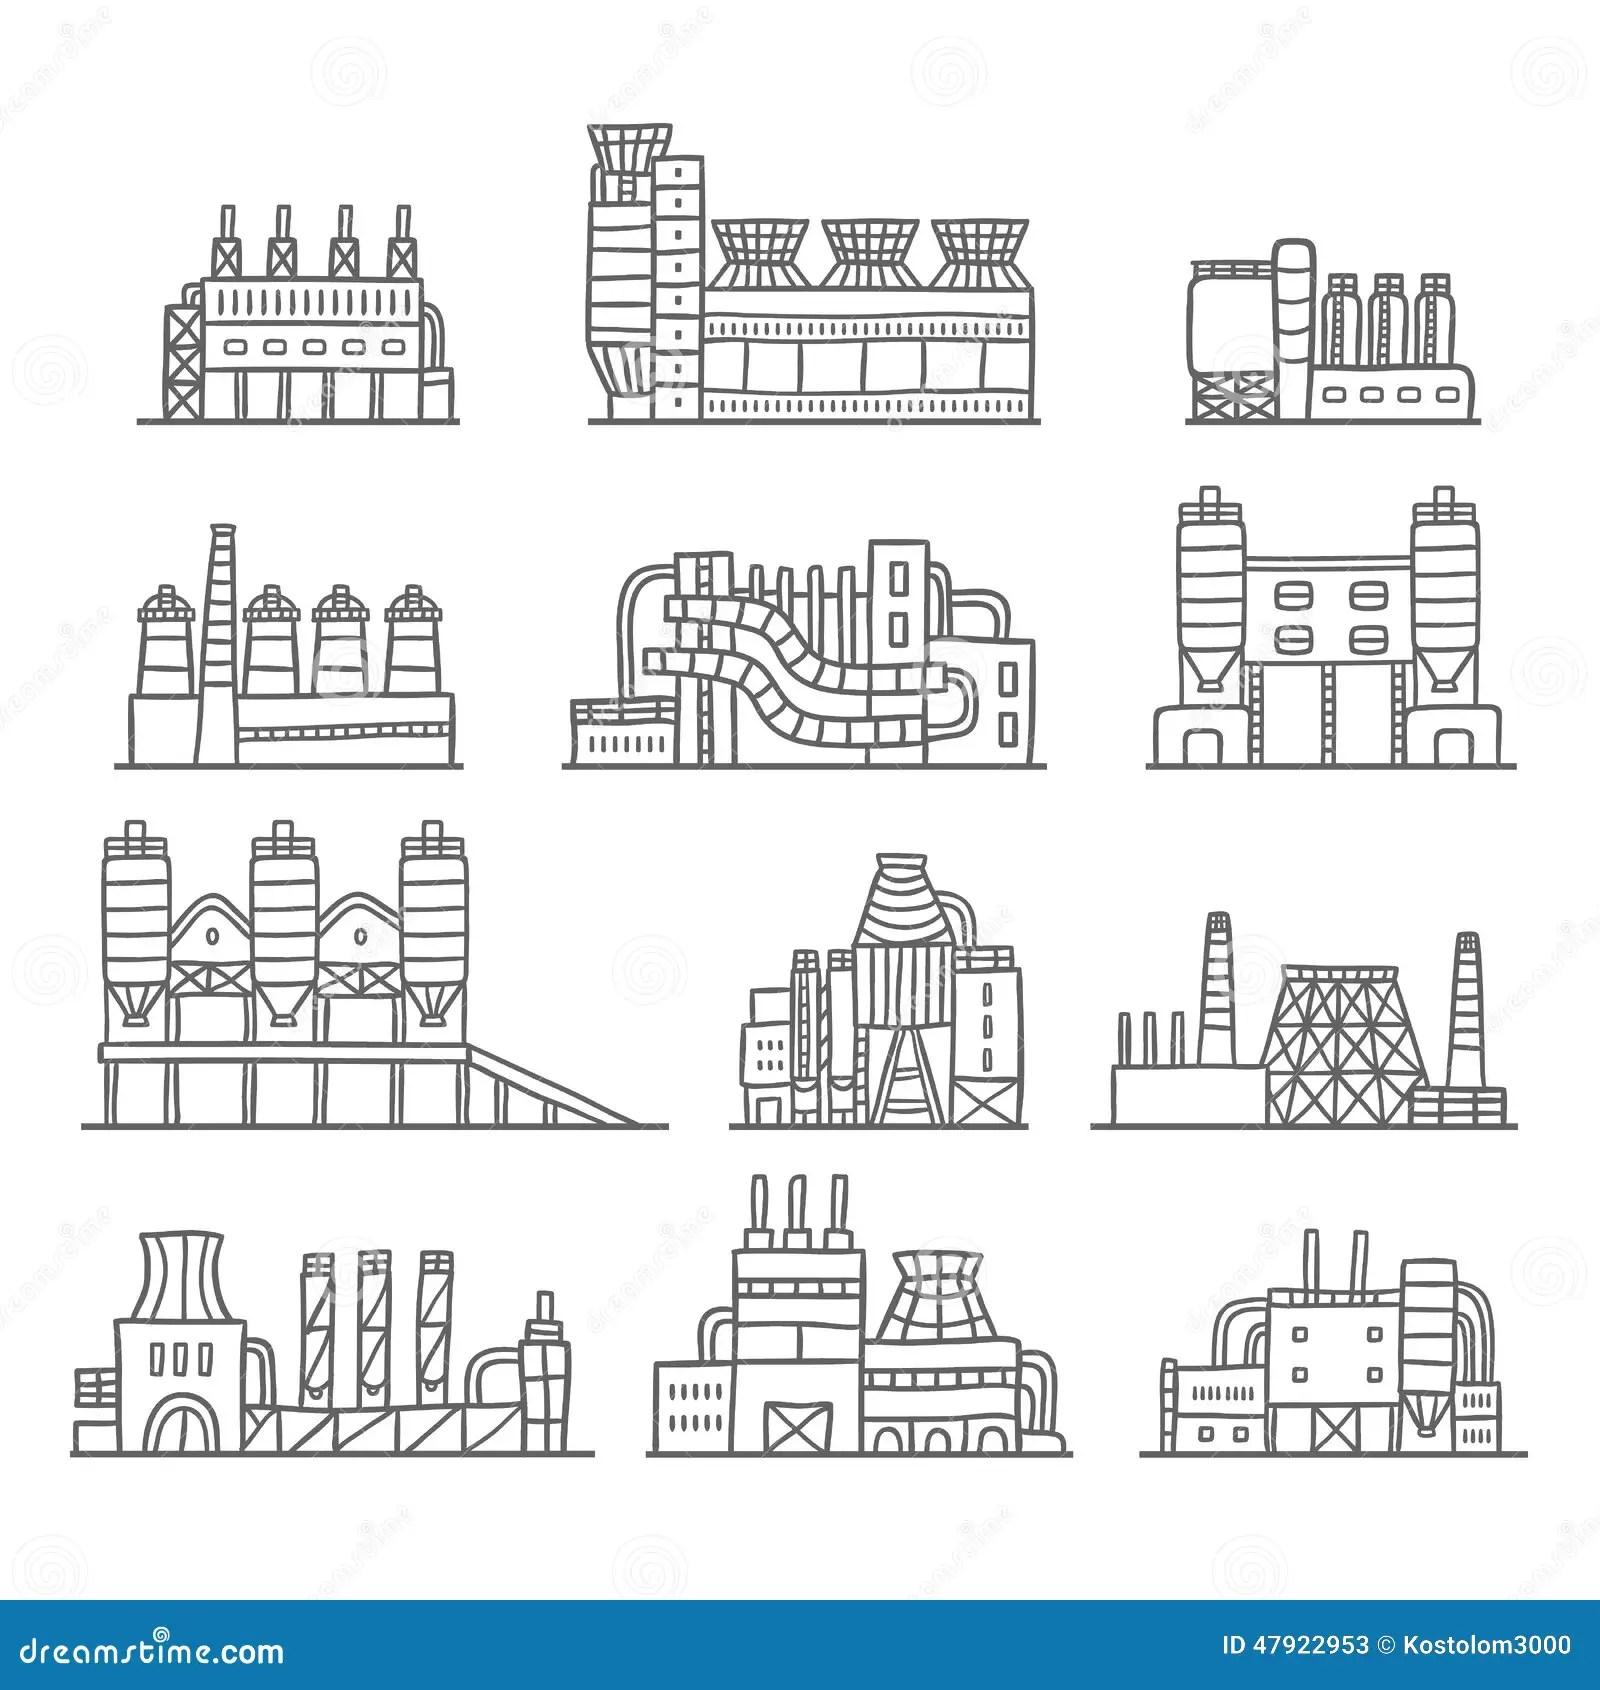 Cute Cartoon Hand Drawn Doodle Factory Set Stock Vector